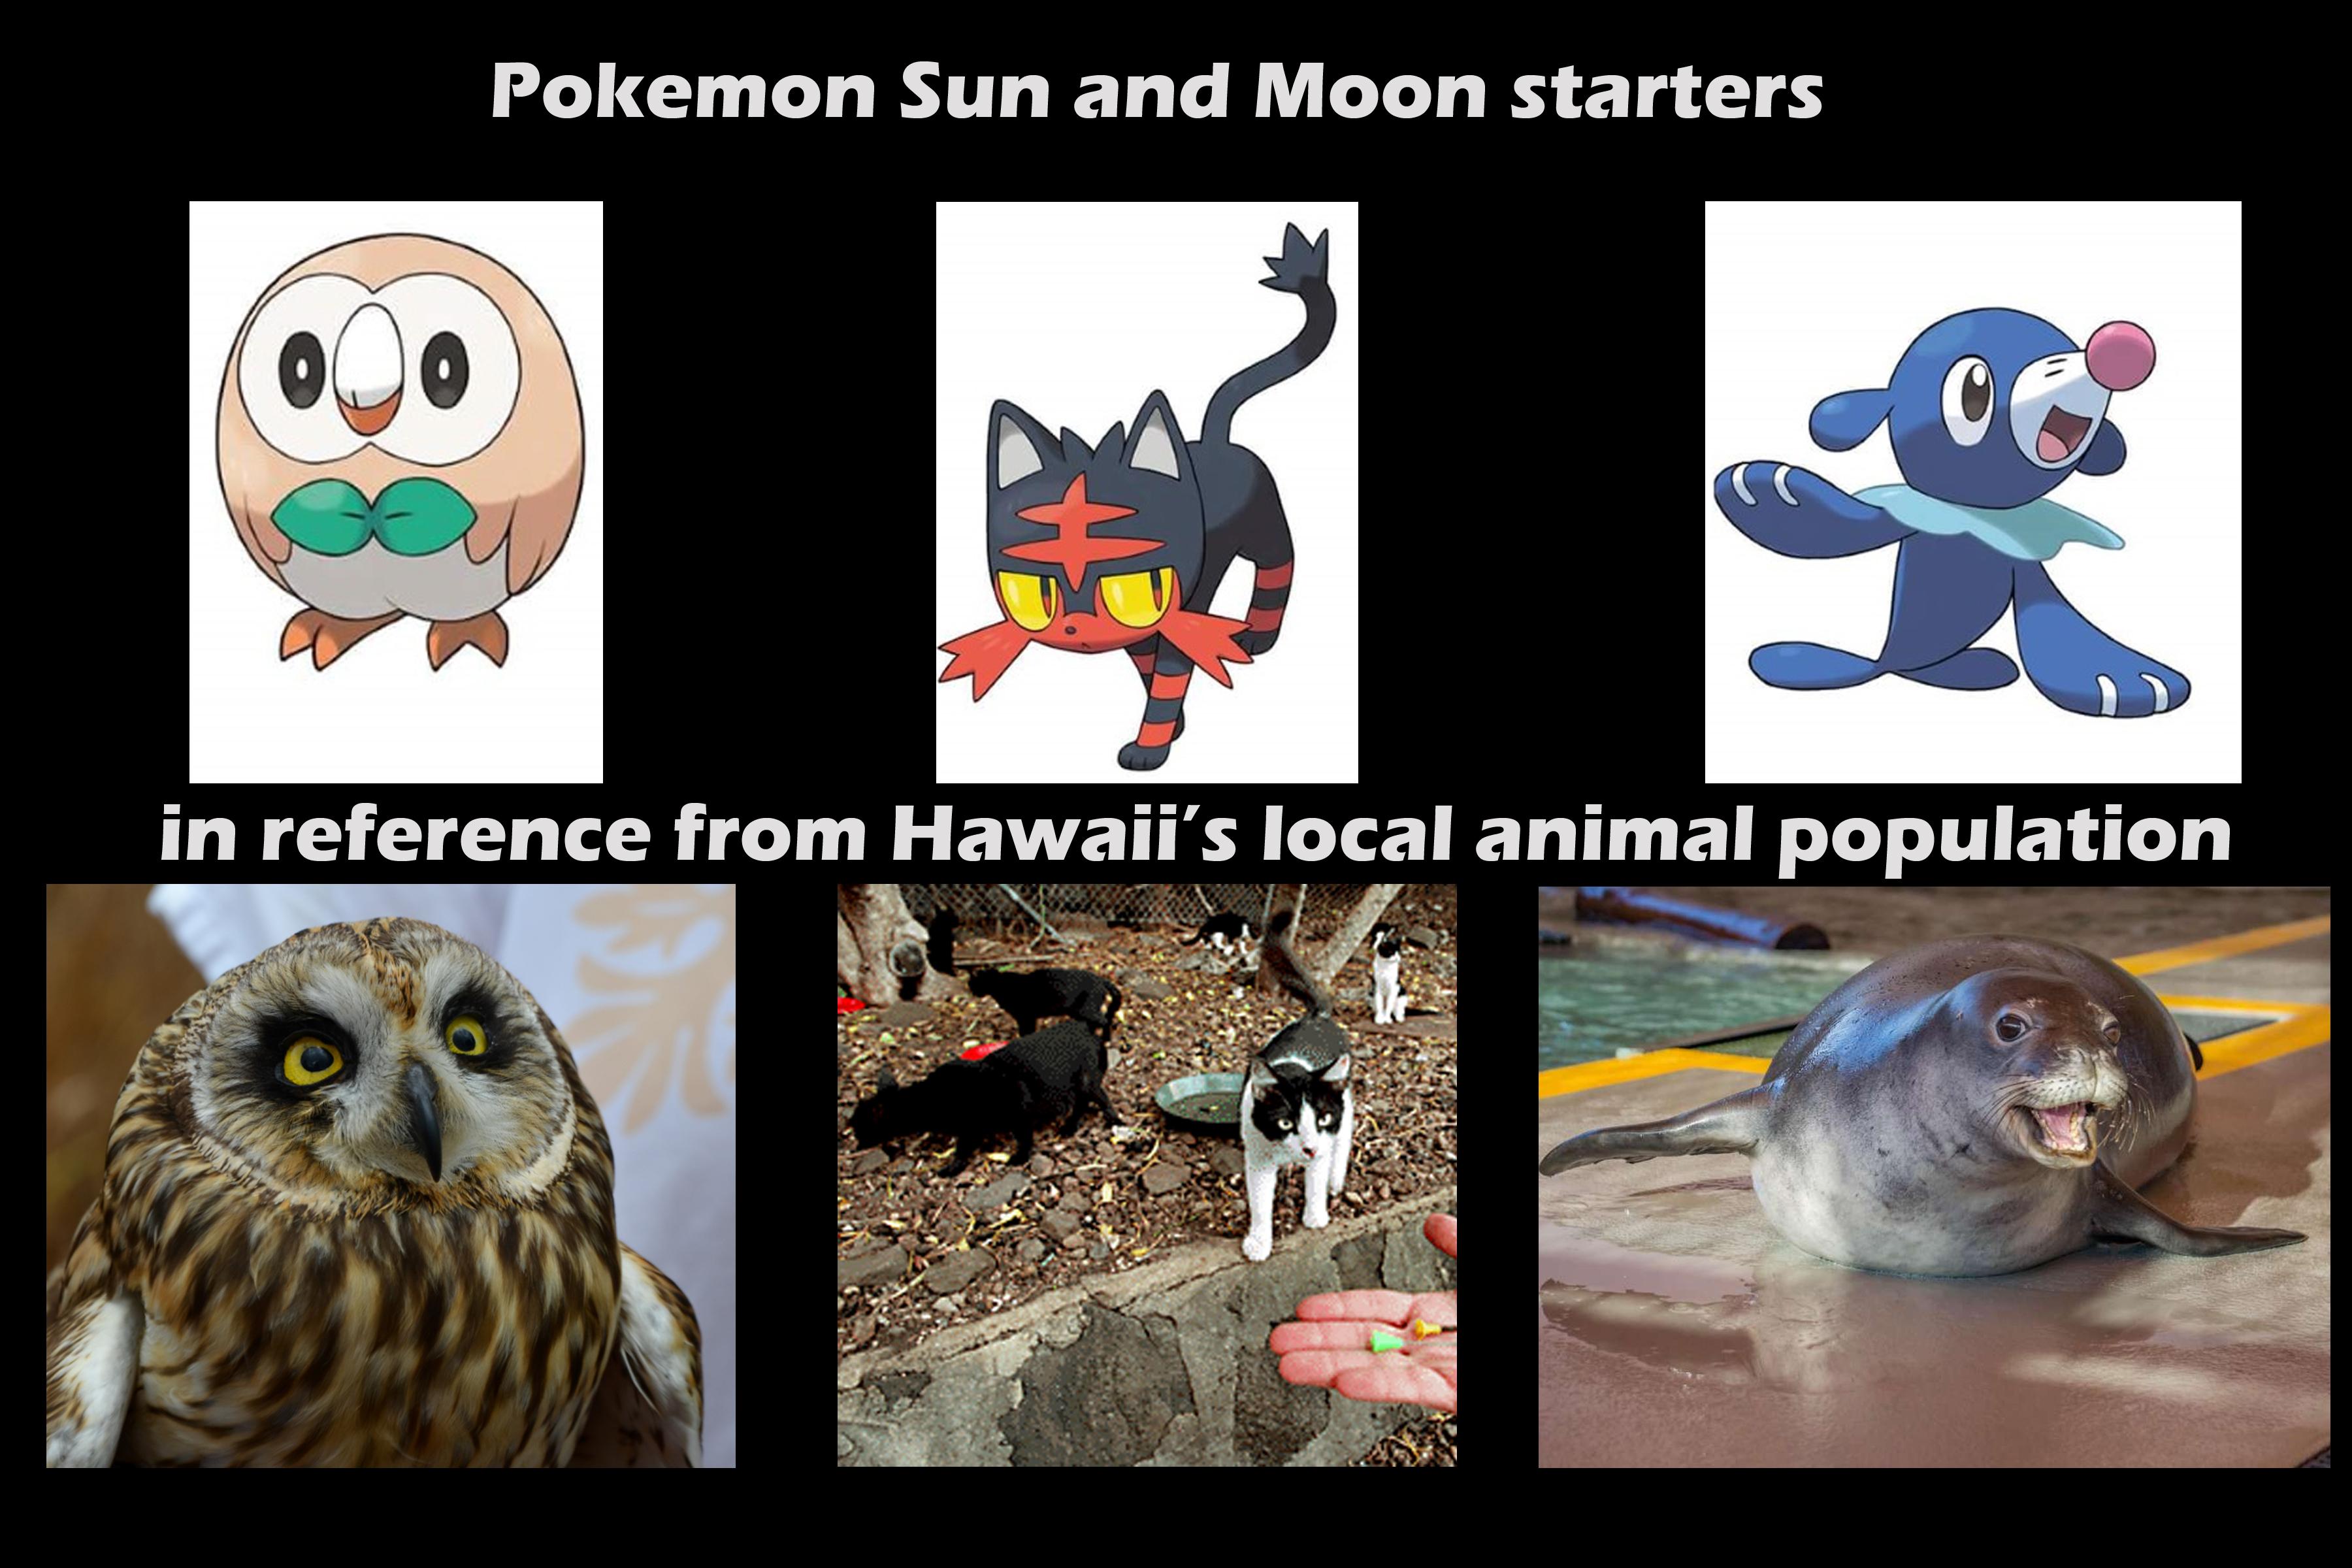 19 Funniest Pokemon Sun And Moon Meme Pictures   MemesBoy